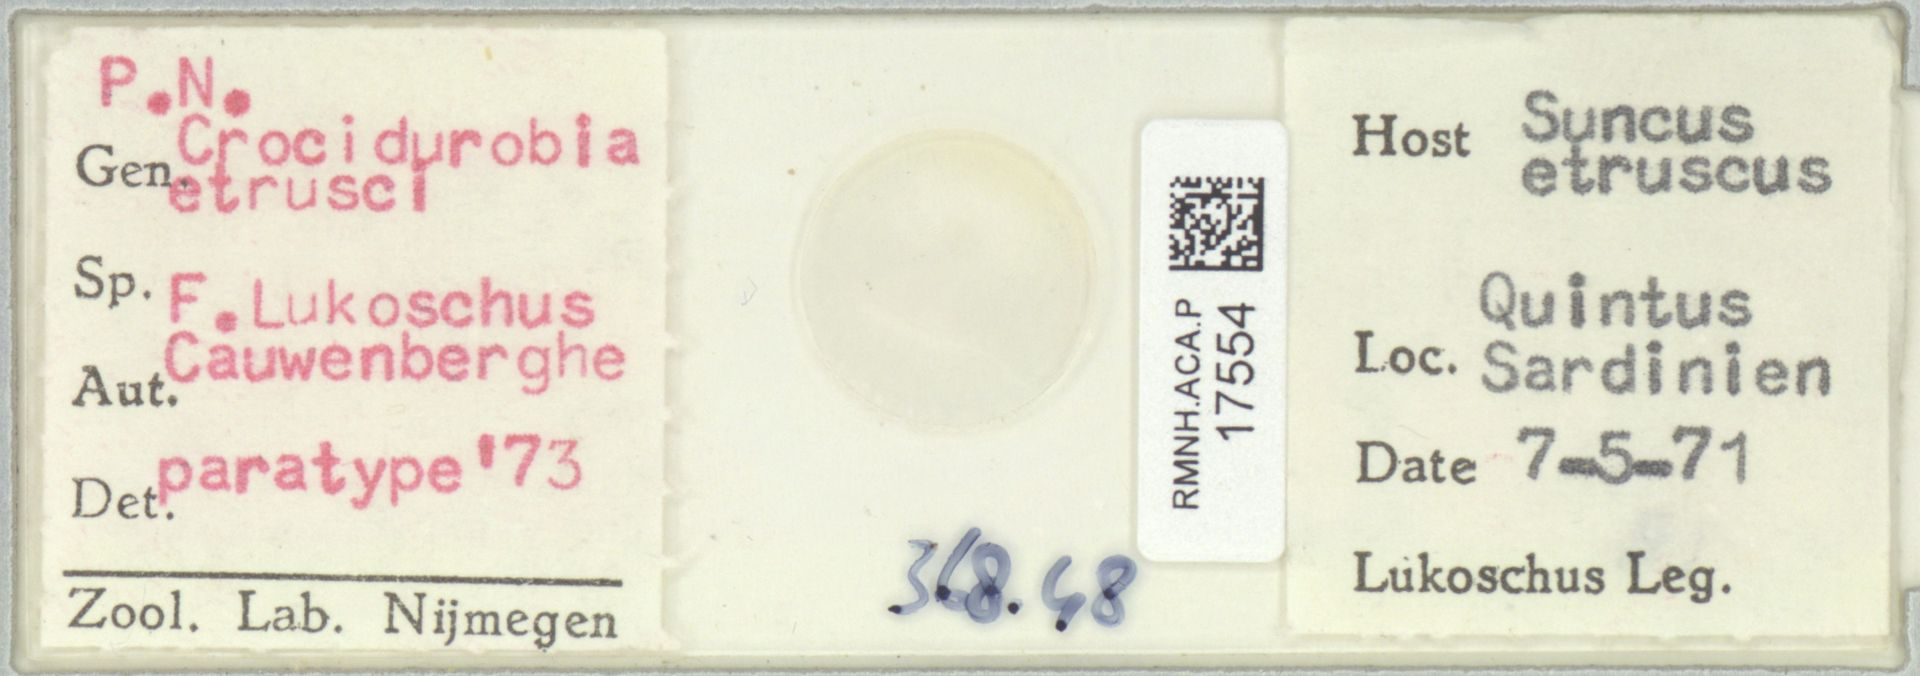 RMNH.ACA.P.17554 | Crocidurobia etrusci F. Lukoschus, Cauwenberghe